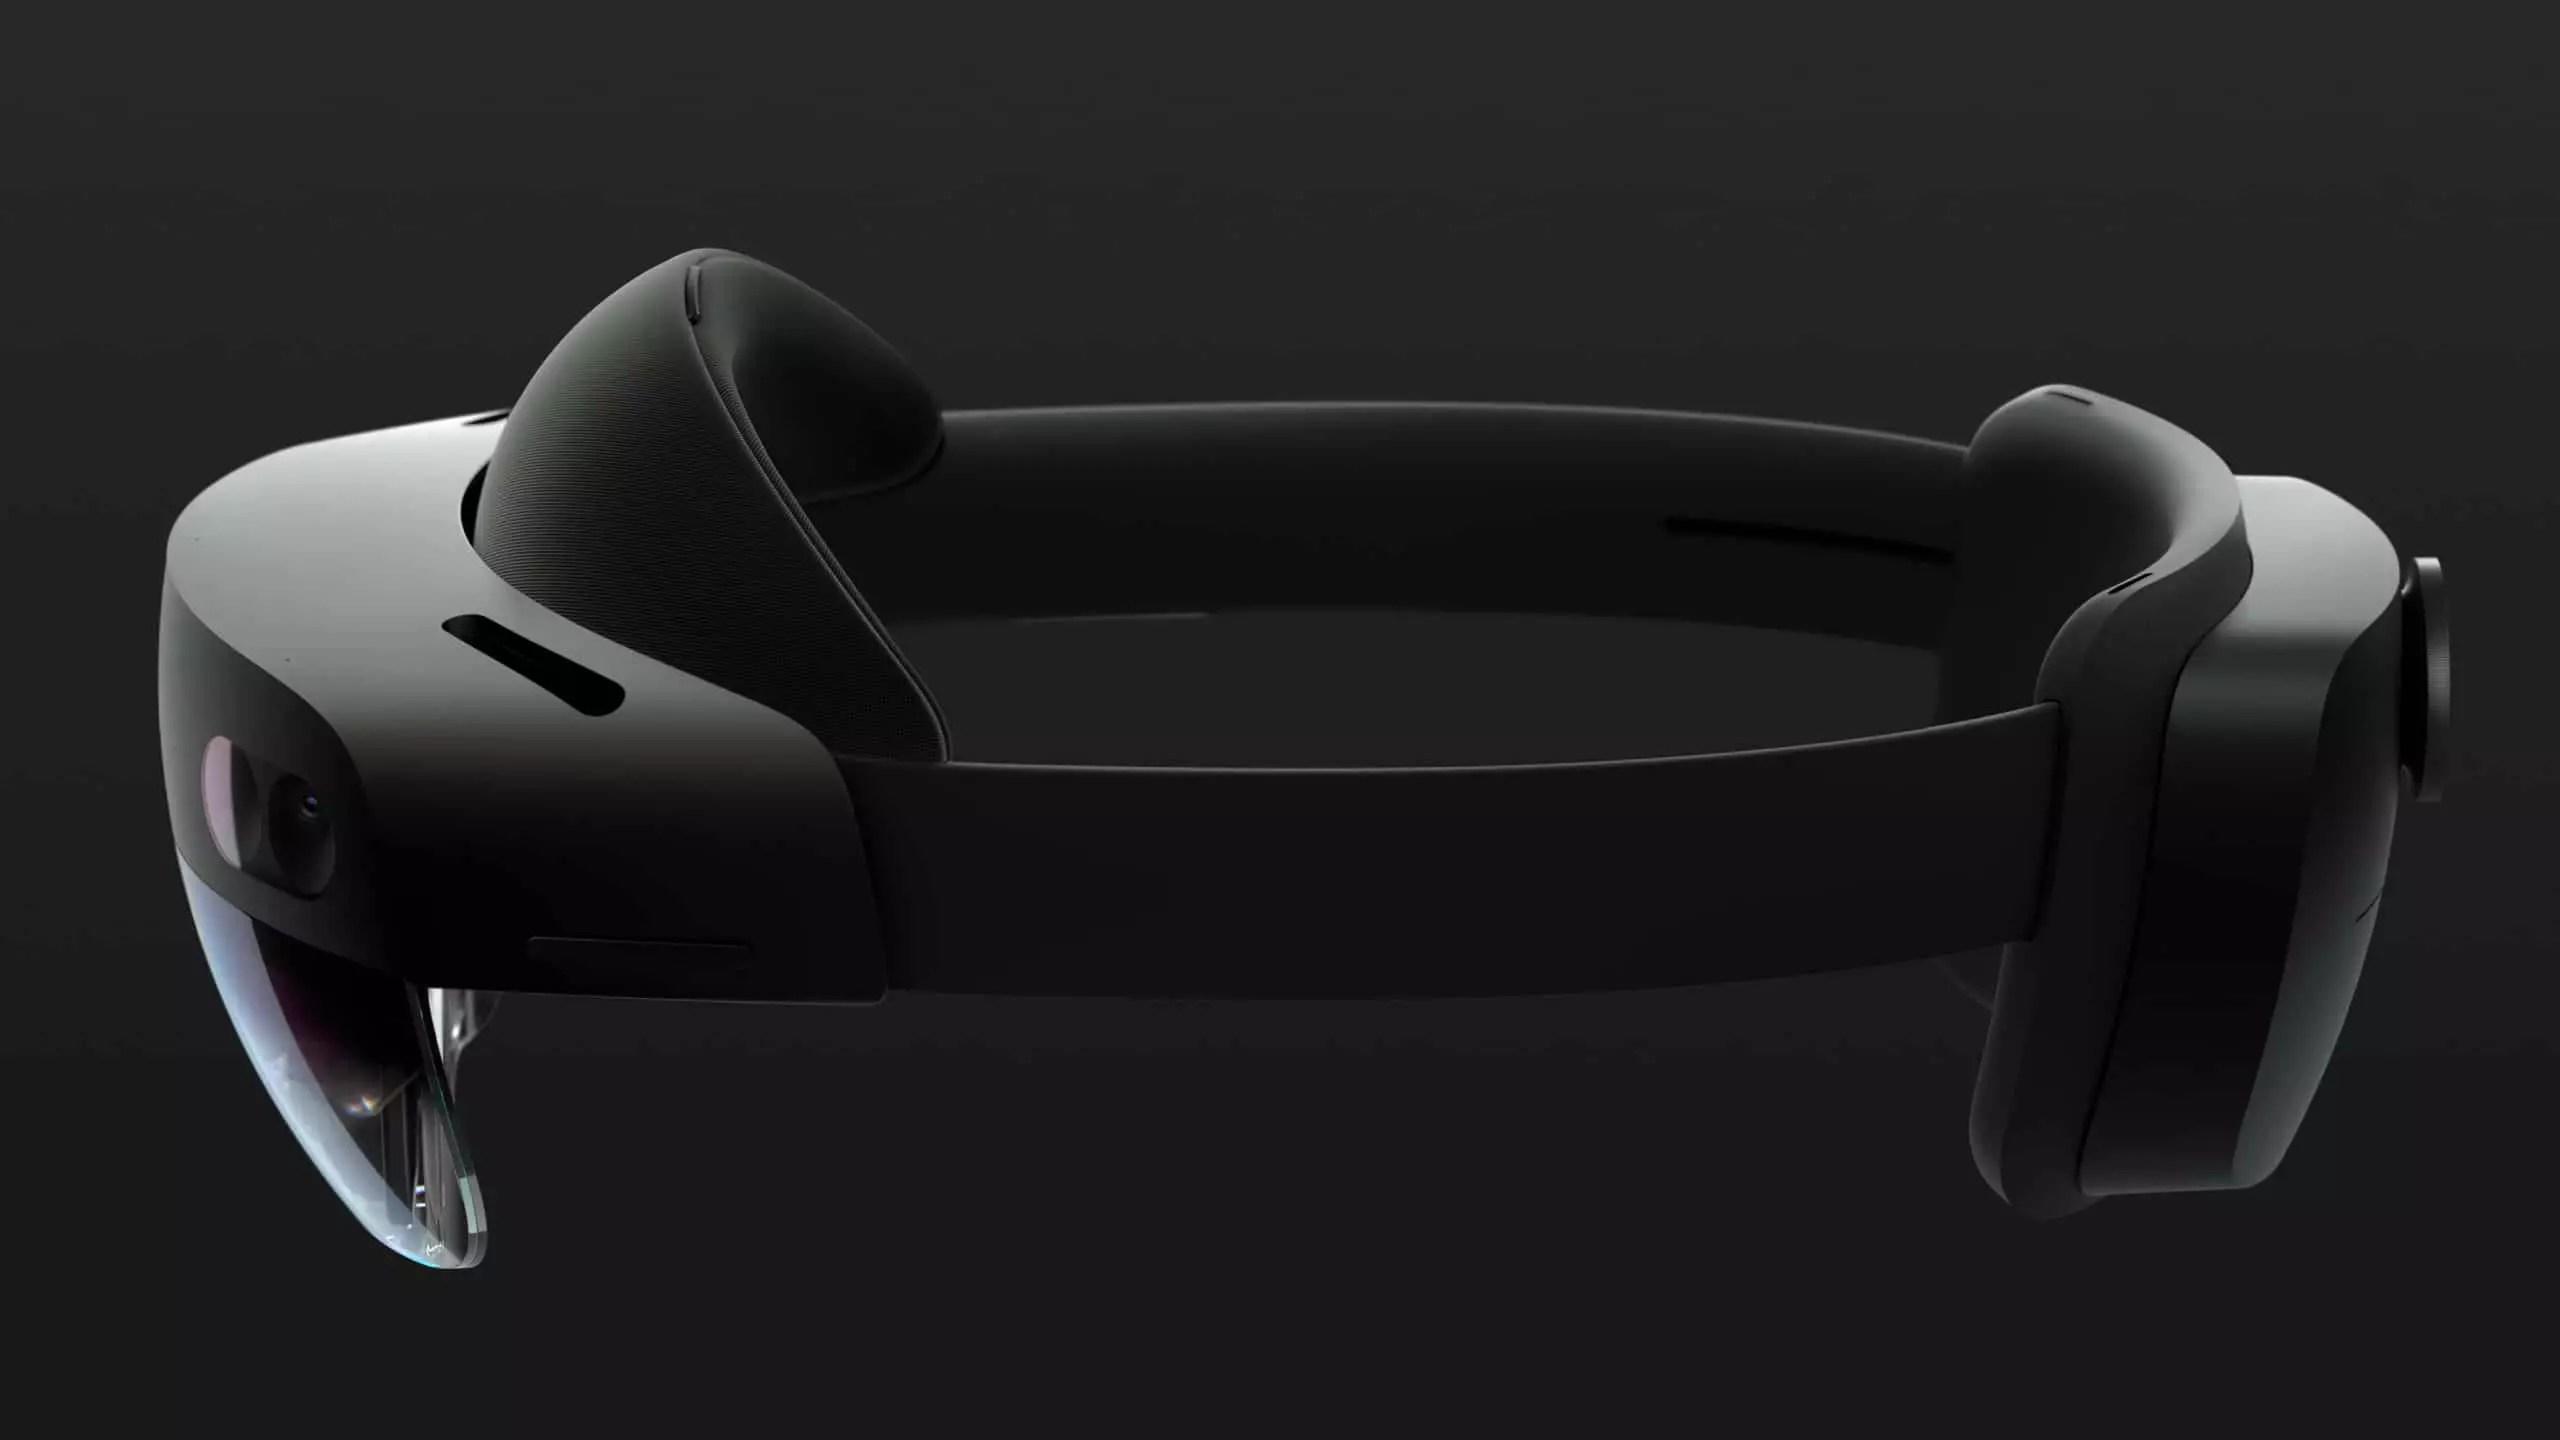 How Will Covid-19 Impact AR & VR Headset Shipments?